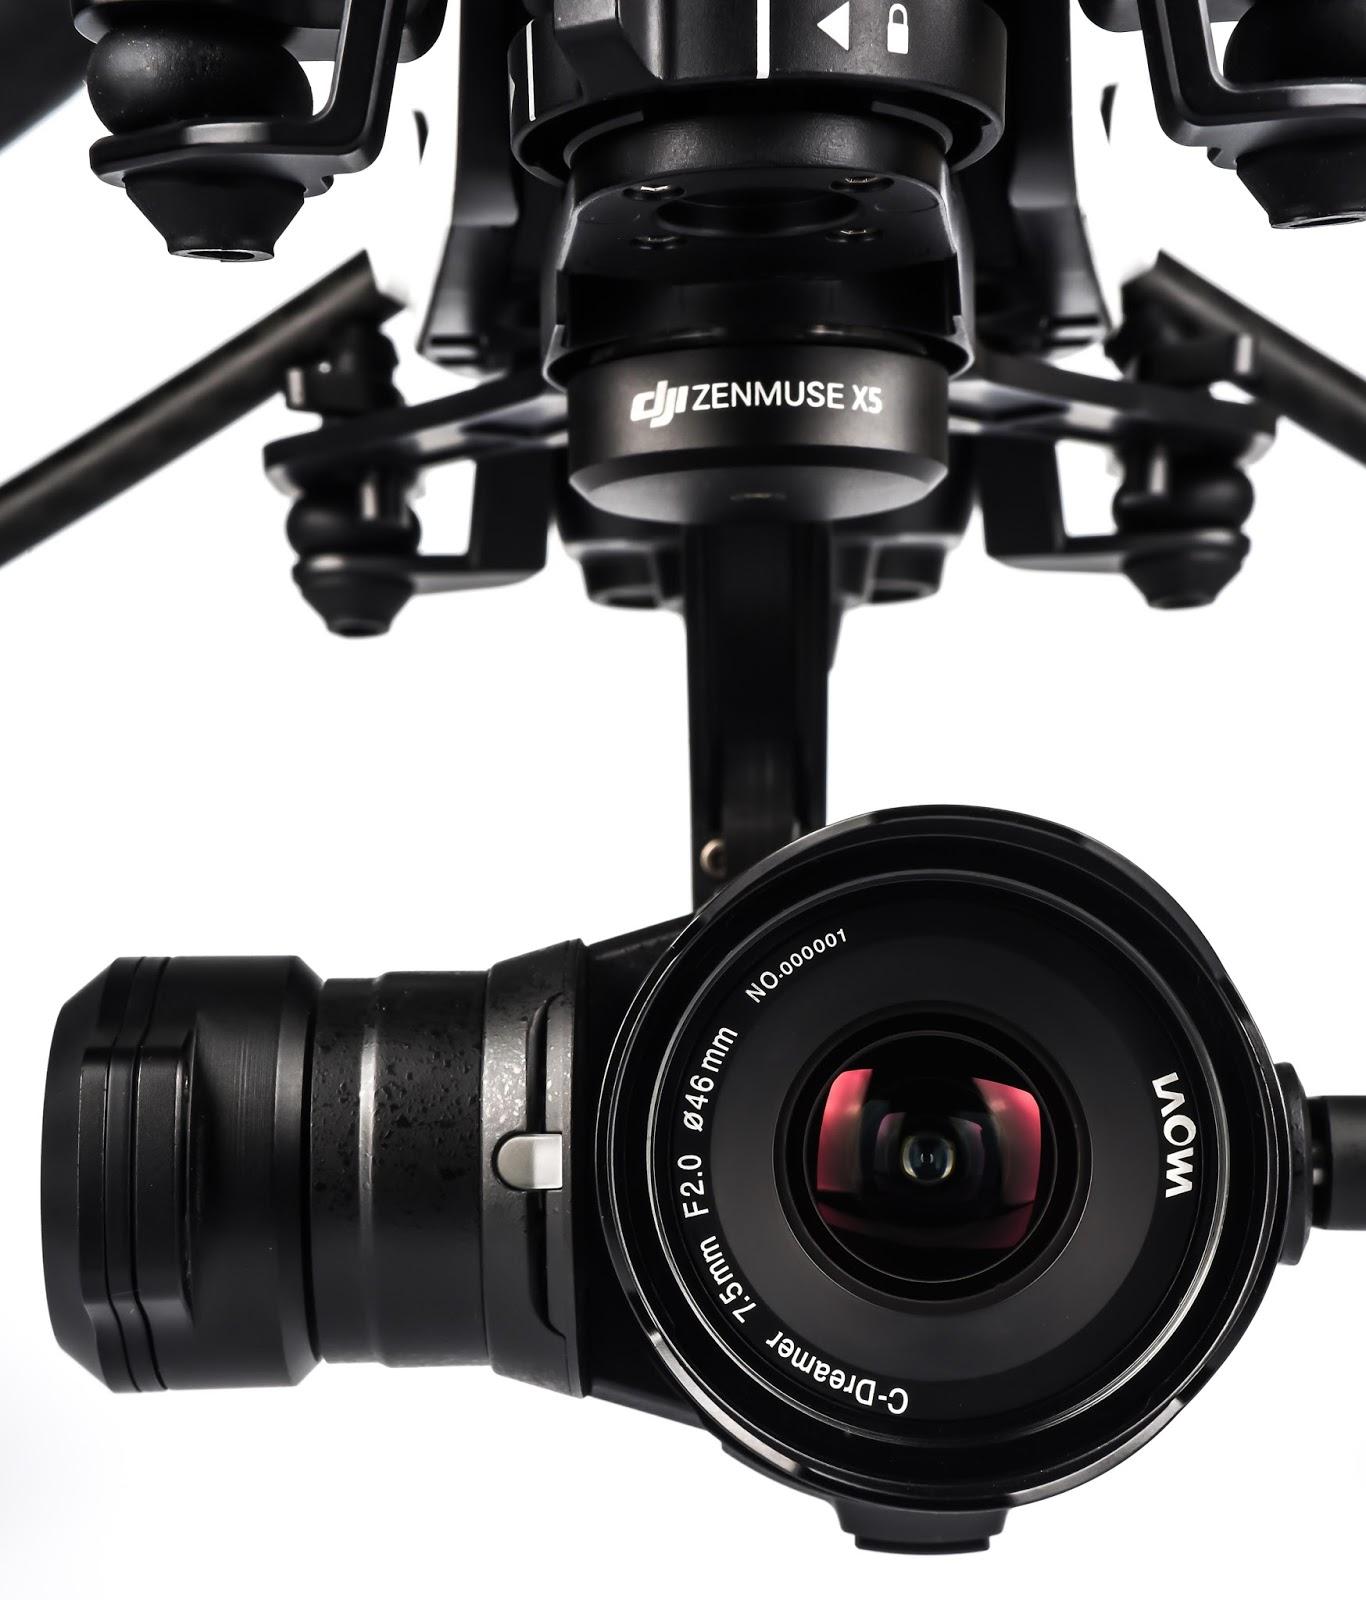 Laowa 7.5mm f/2.0 на камере DJI X5, установленной на дроне